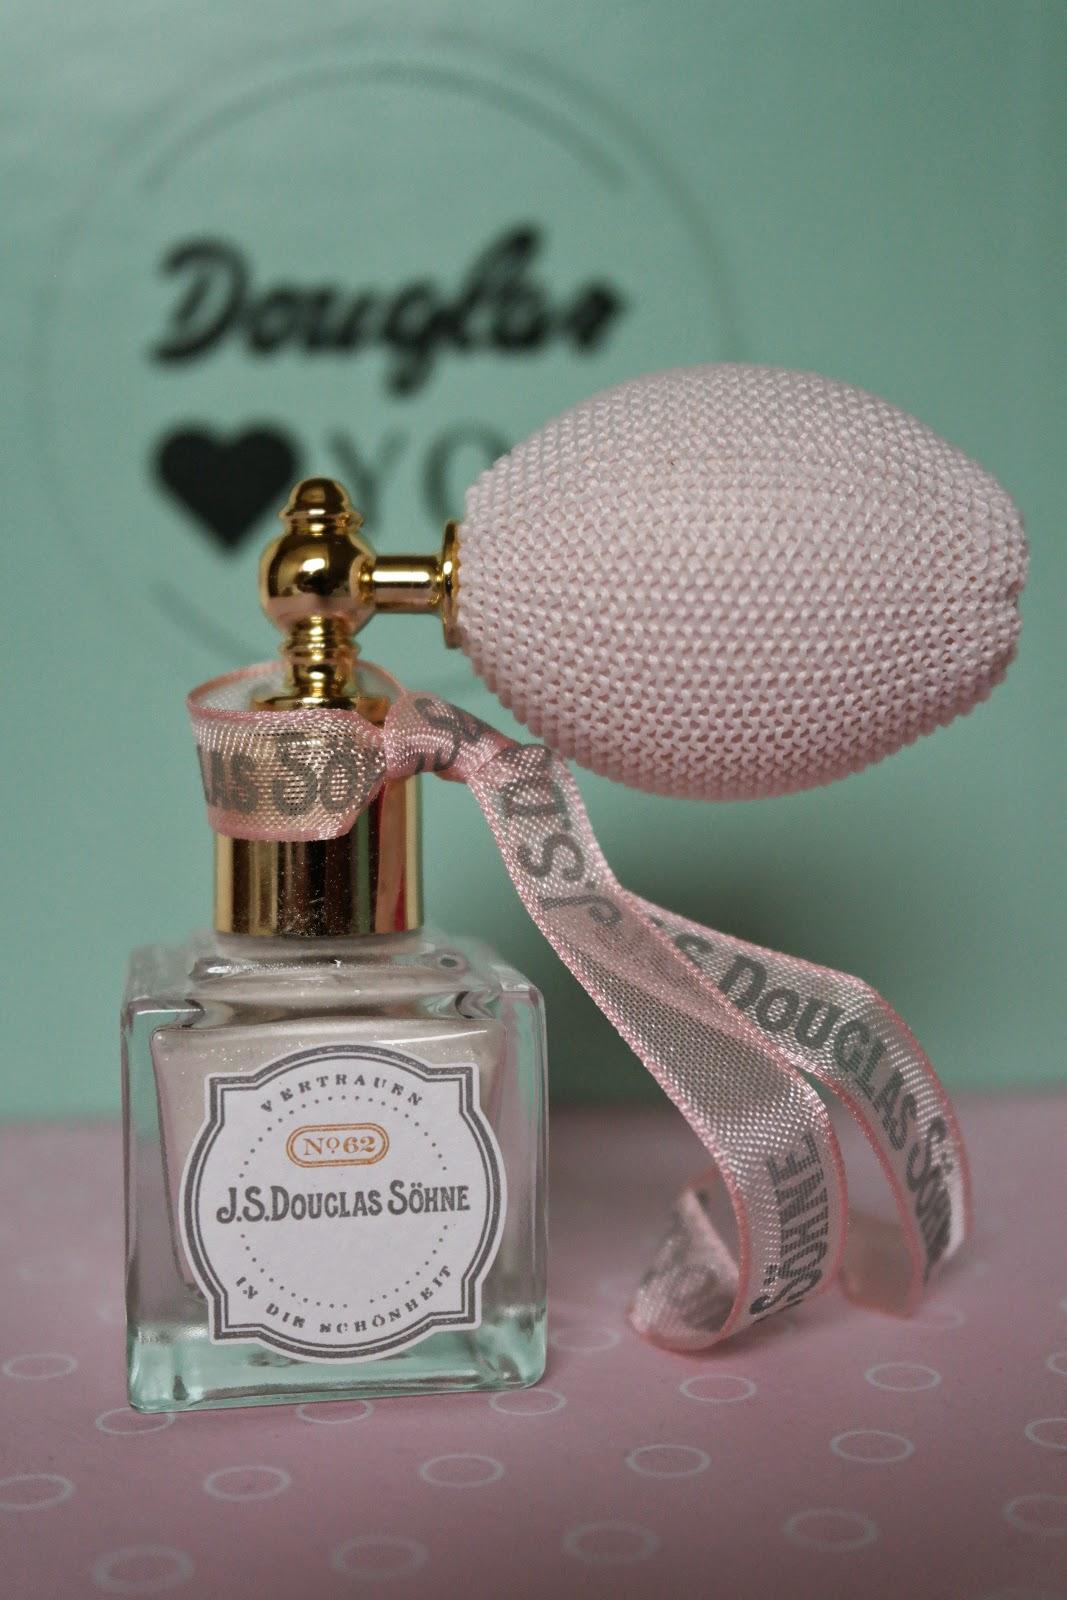 Douglas Box Of Beauty November 2014 Test Und Liebe